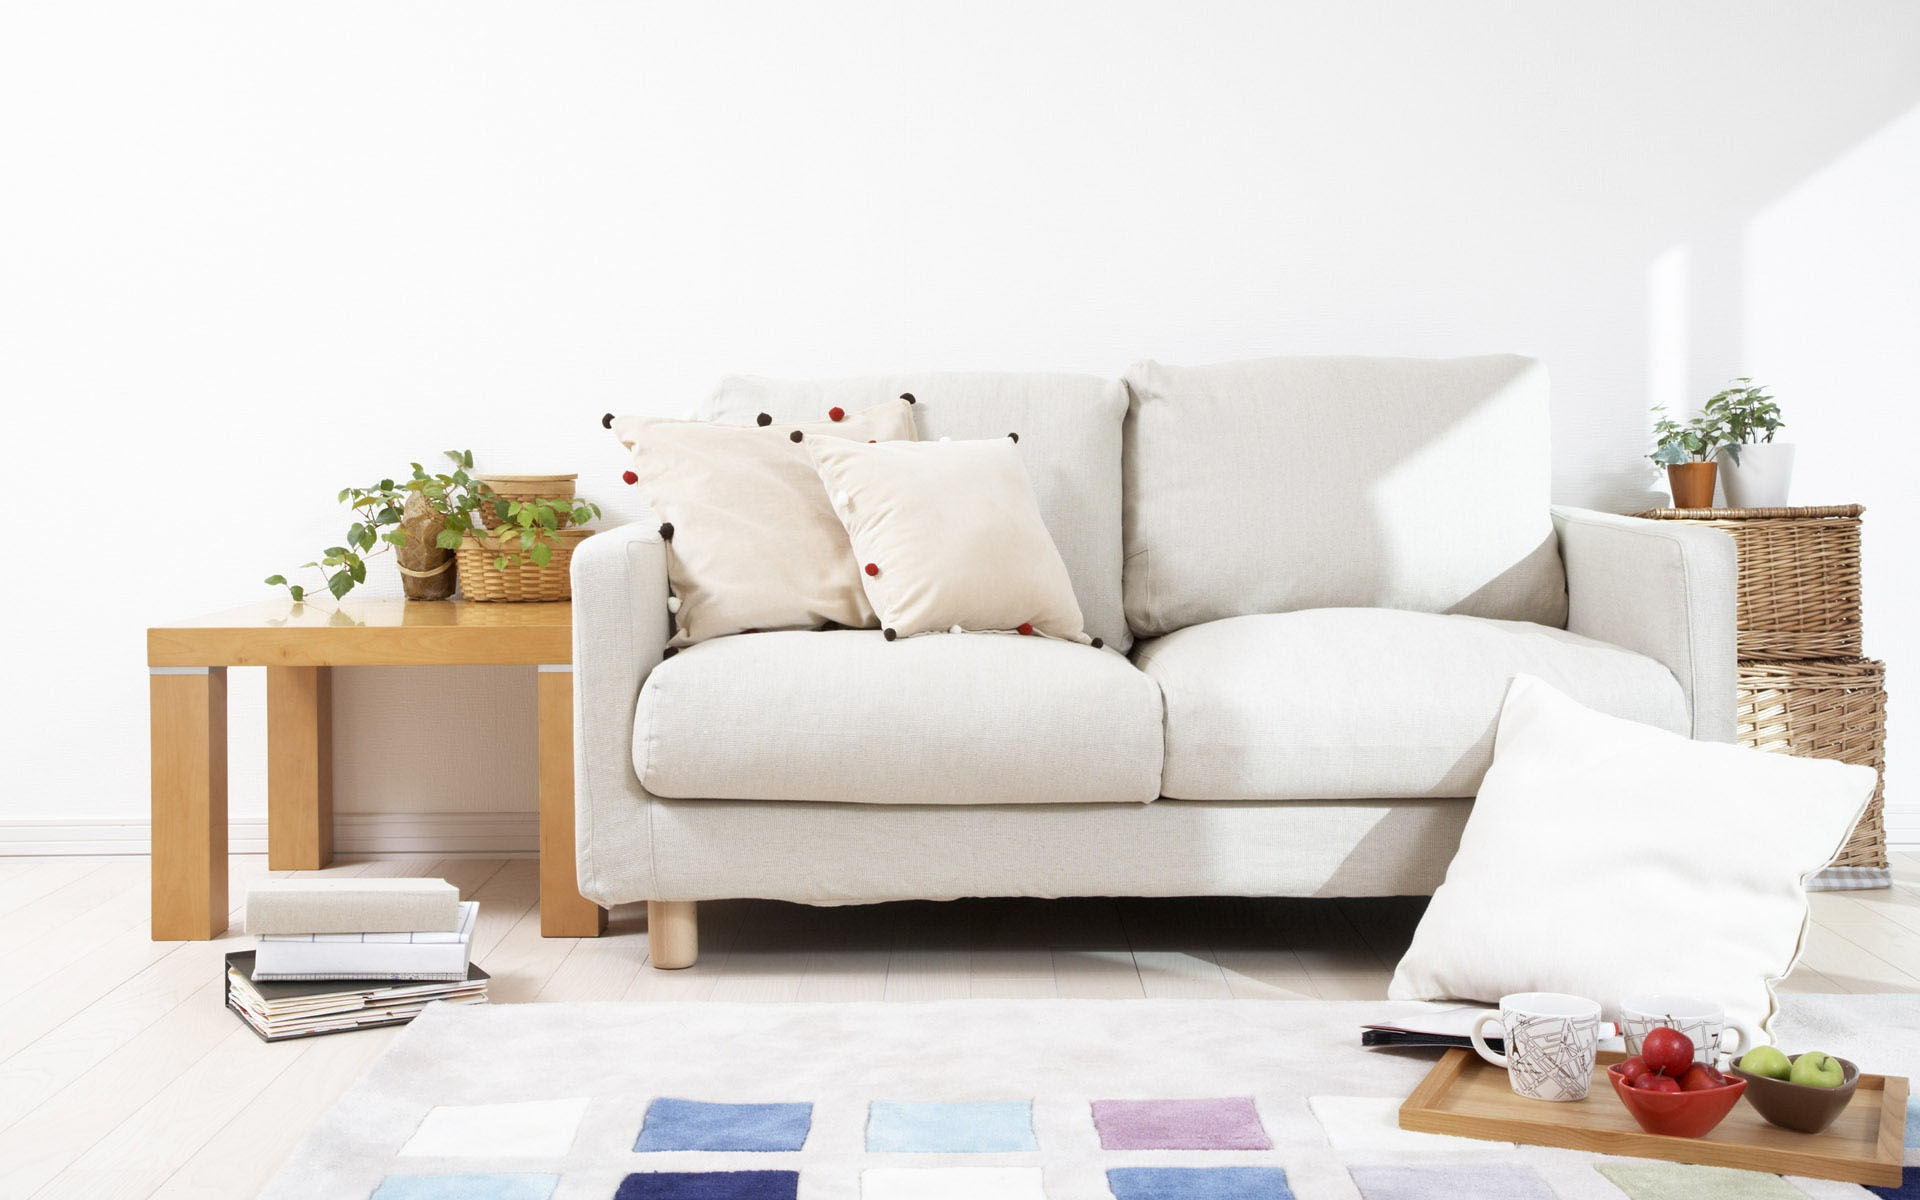 modern home interior design 1920x1200